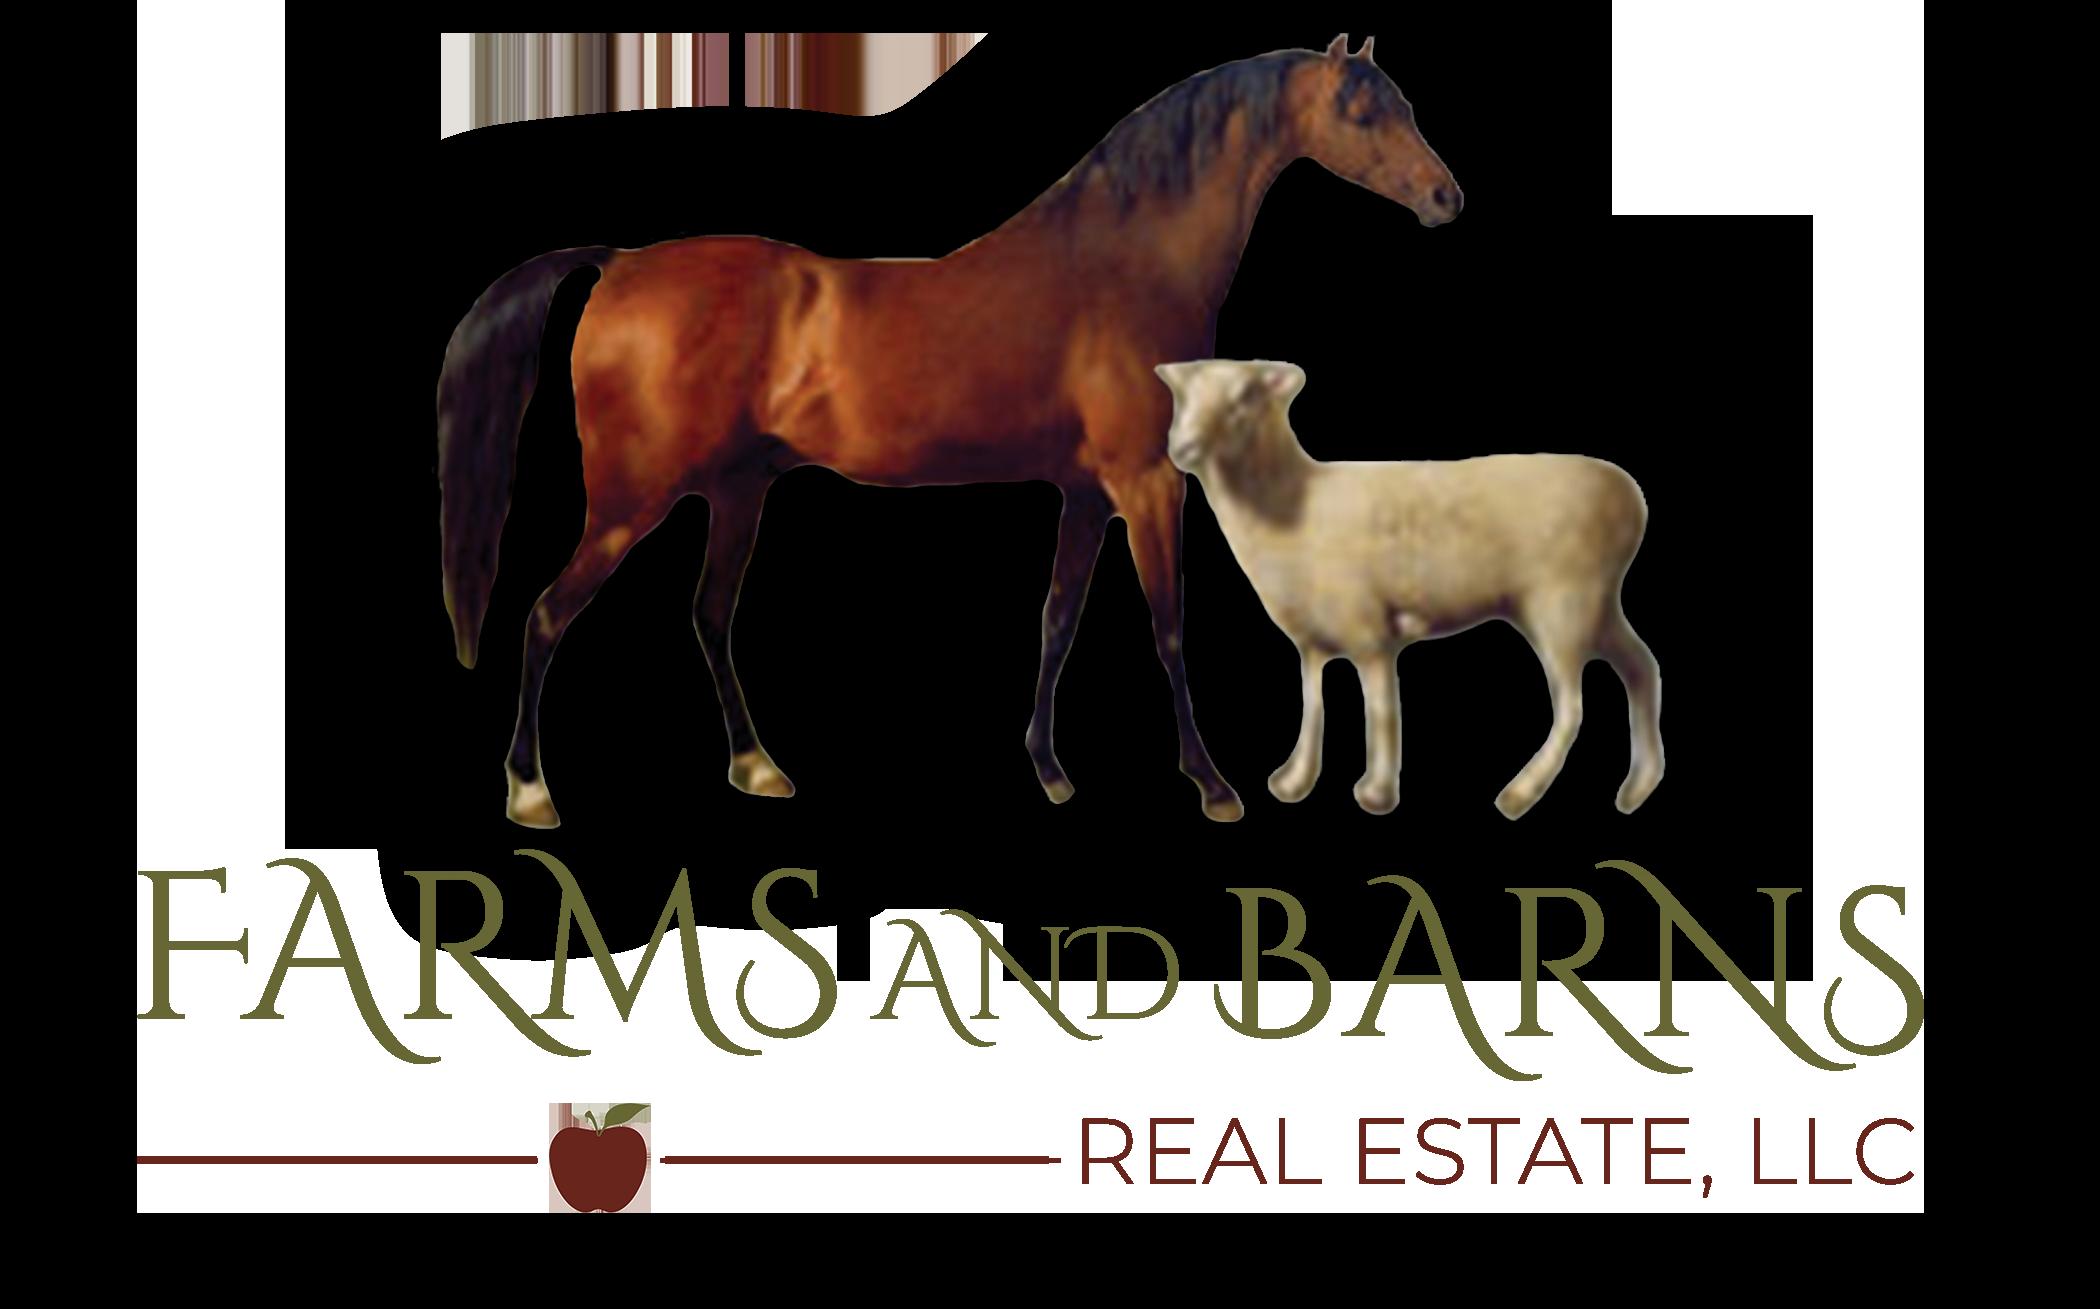 Farms & barns.png